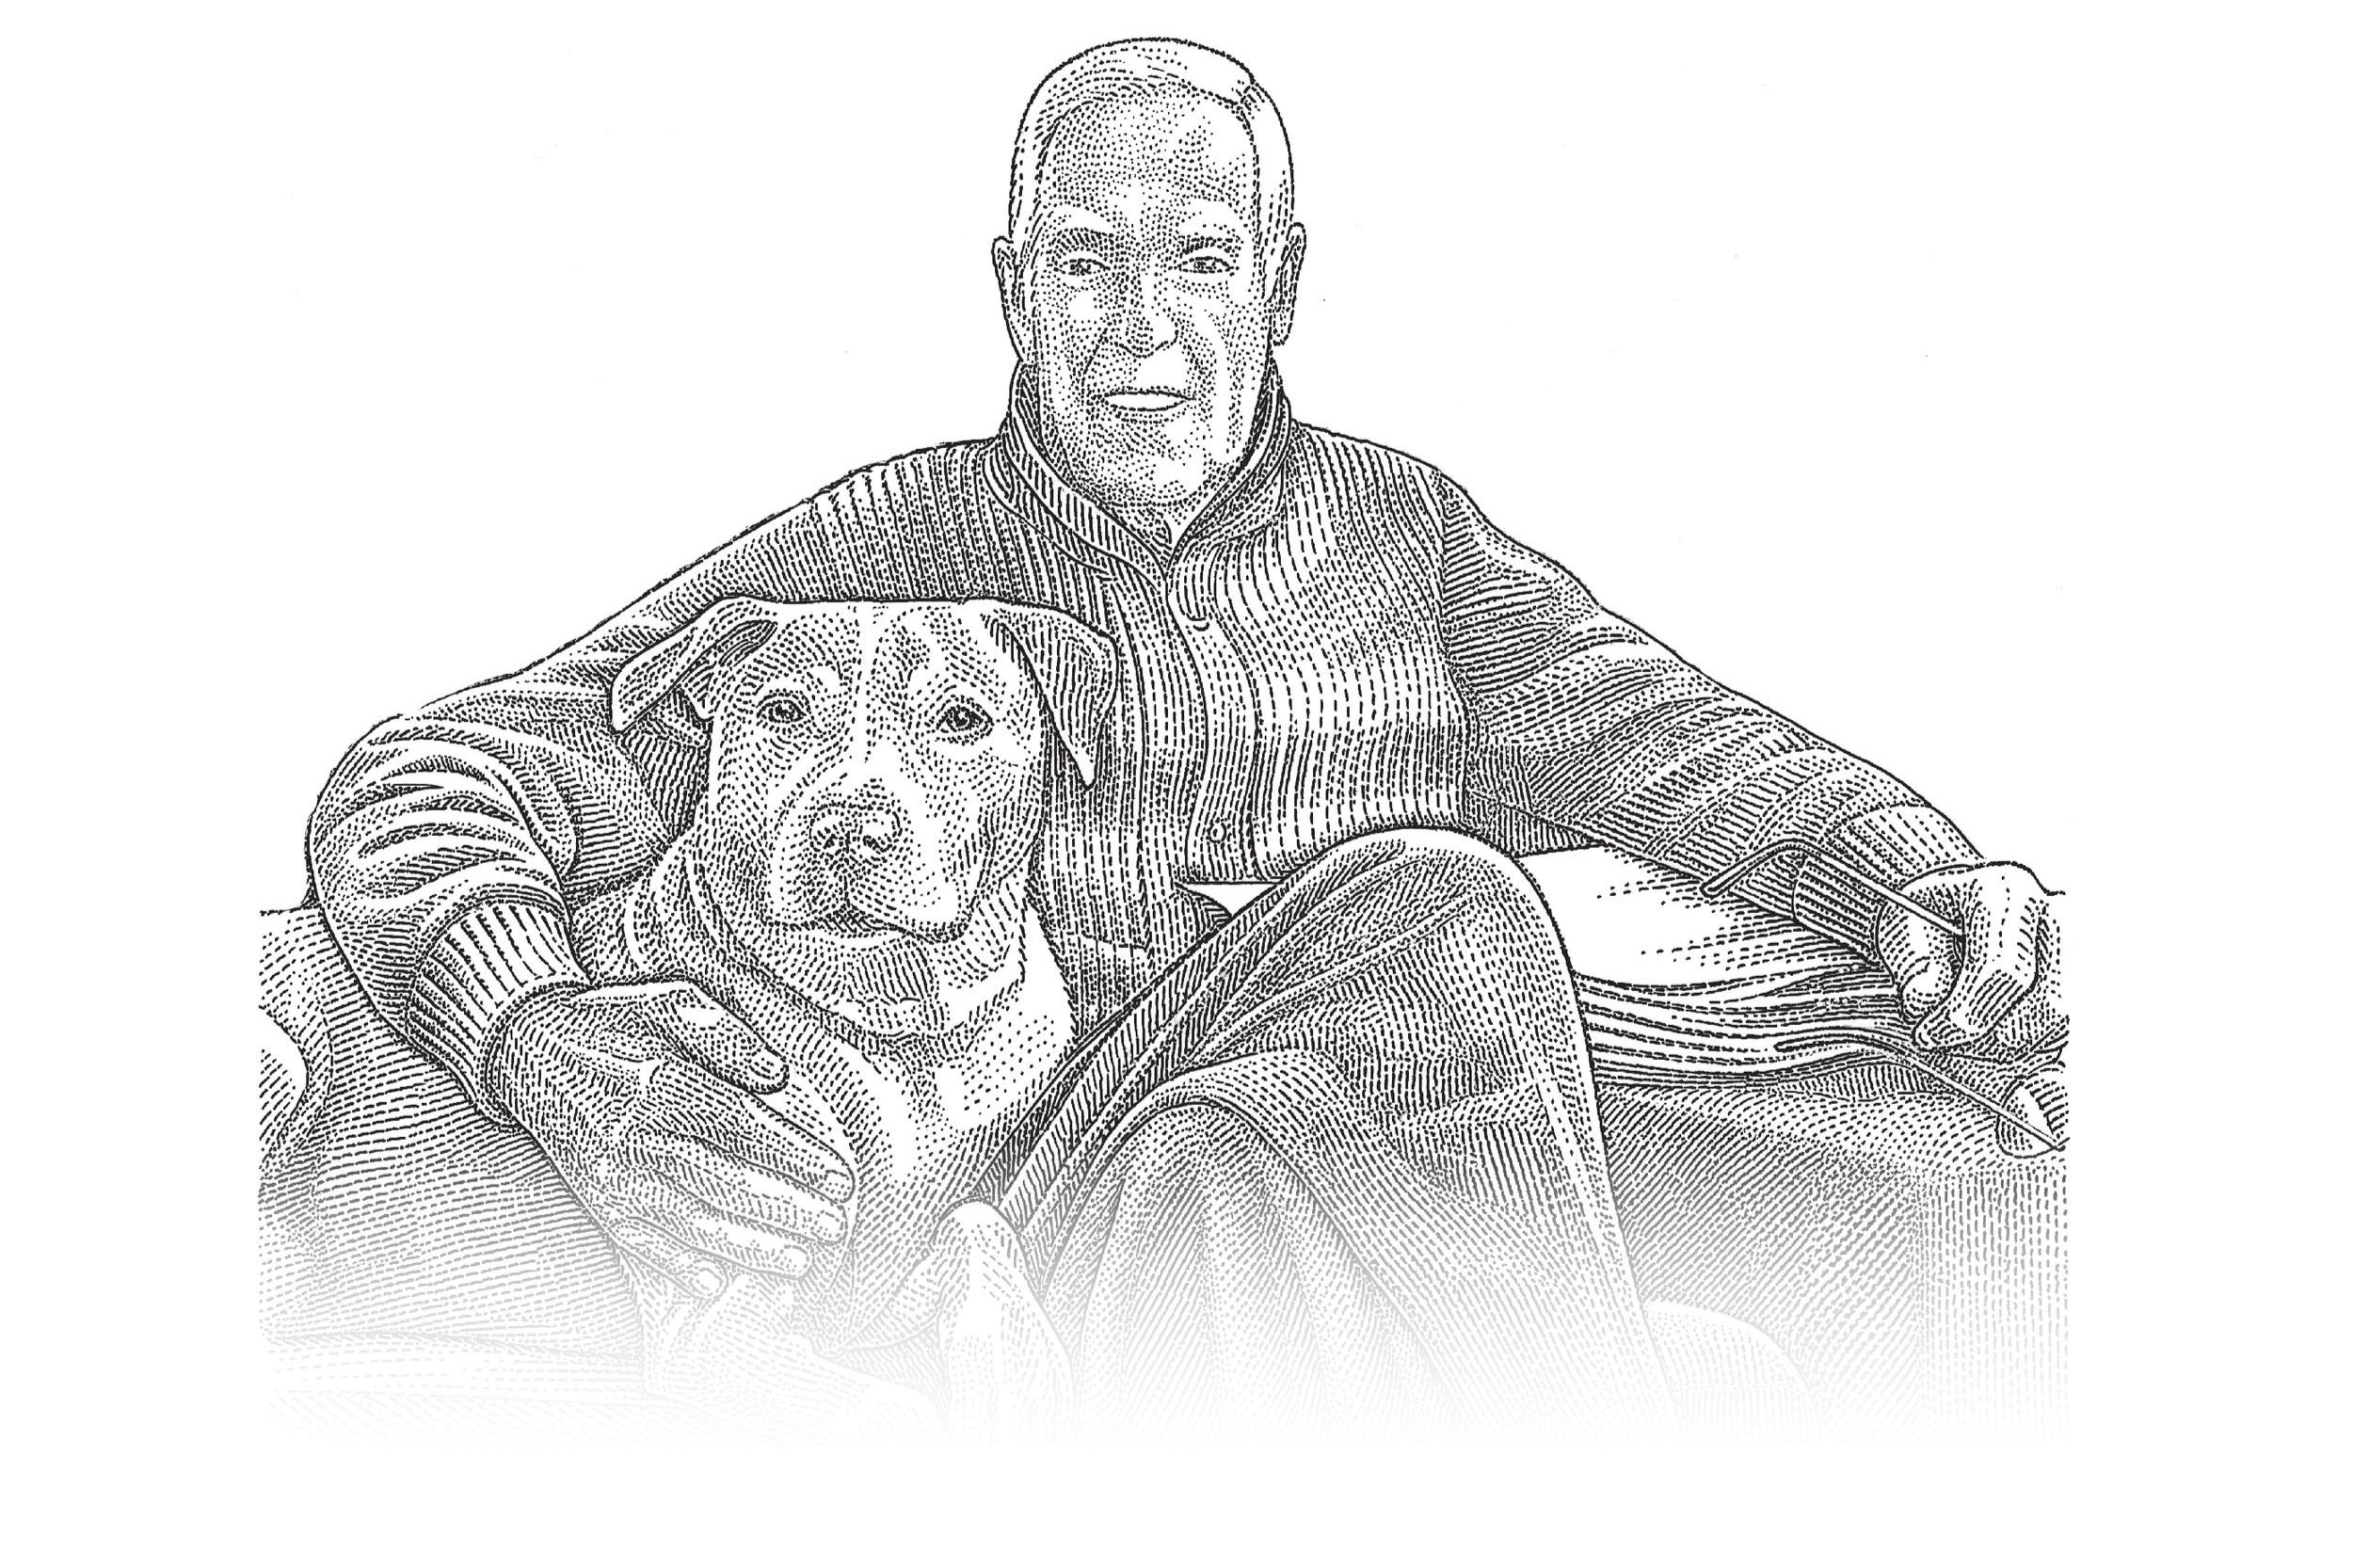 Papa & Barkley, the namesakes for the brand